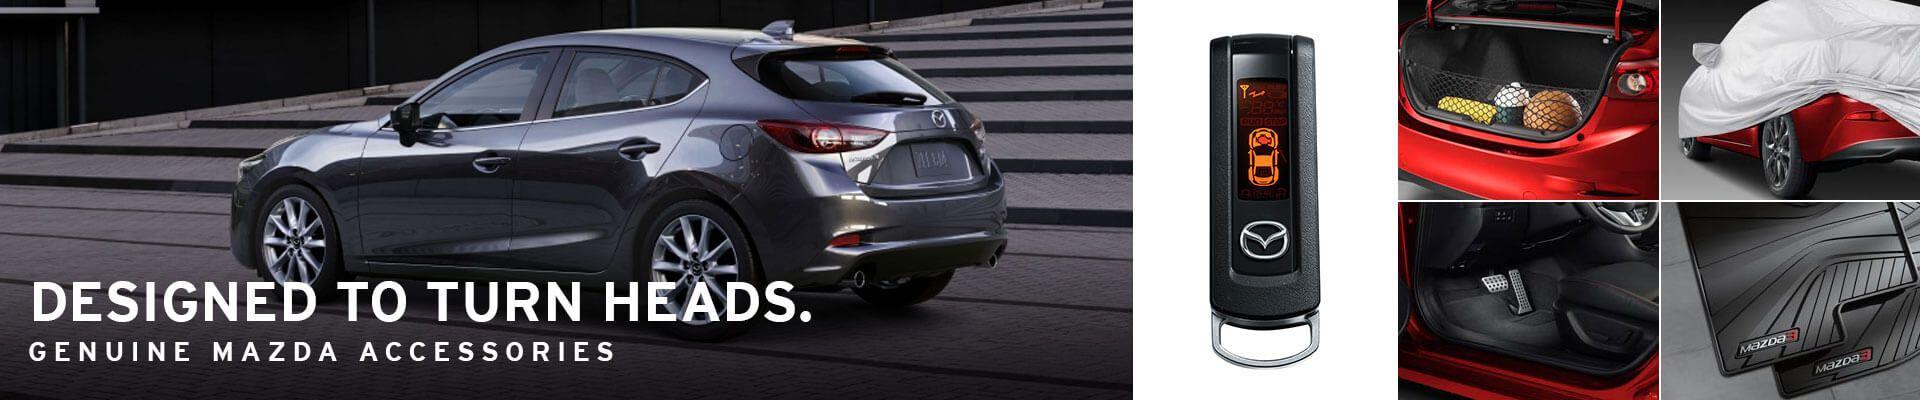 OEM Mazda Accessories